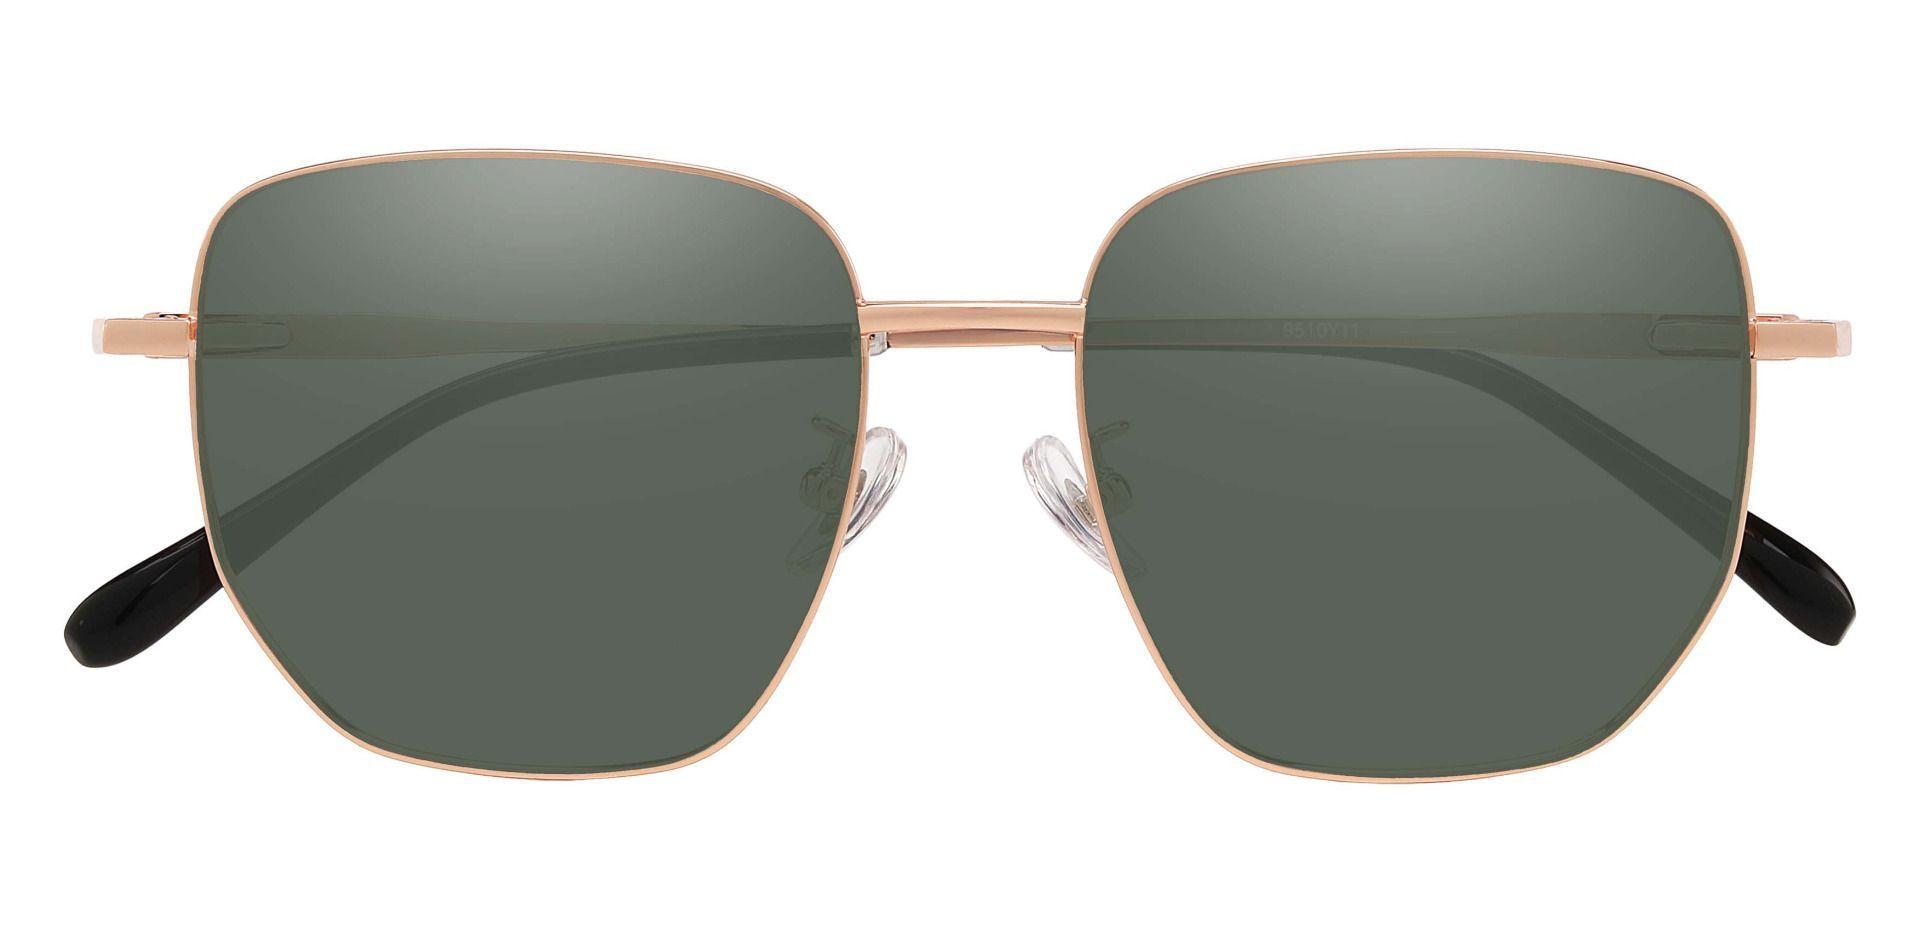 Swayze Geometric Prescription Sunglasses - Gold Frame With Green Lenses